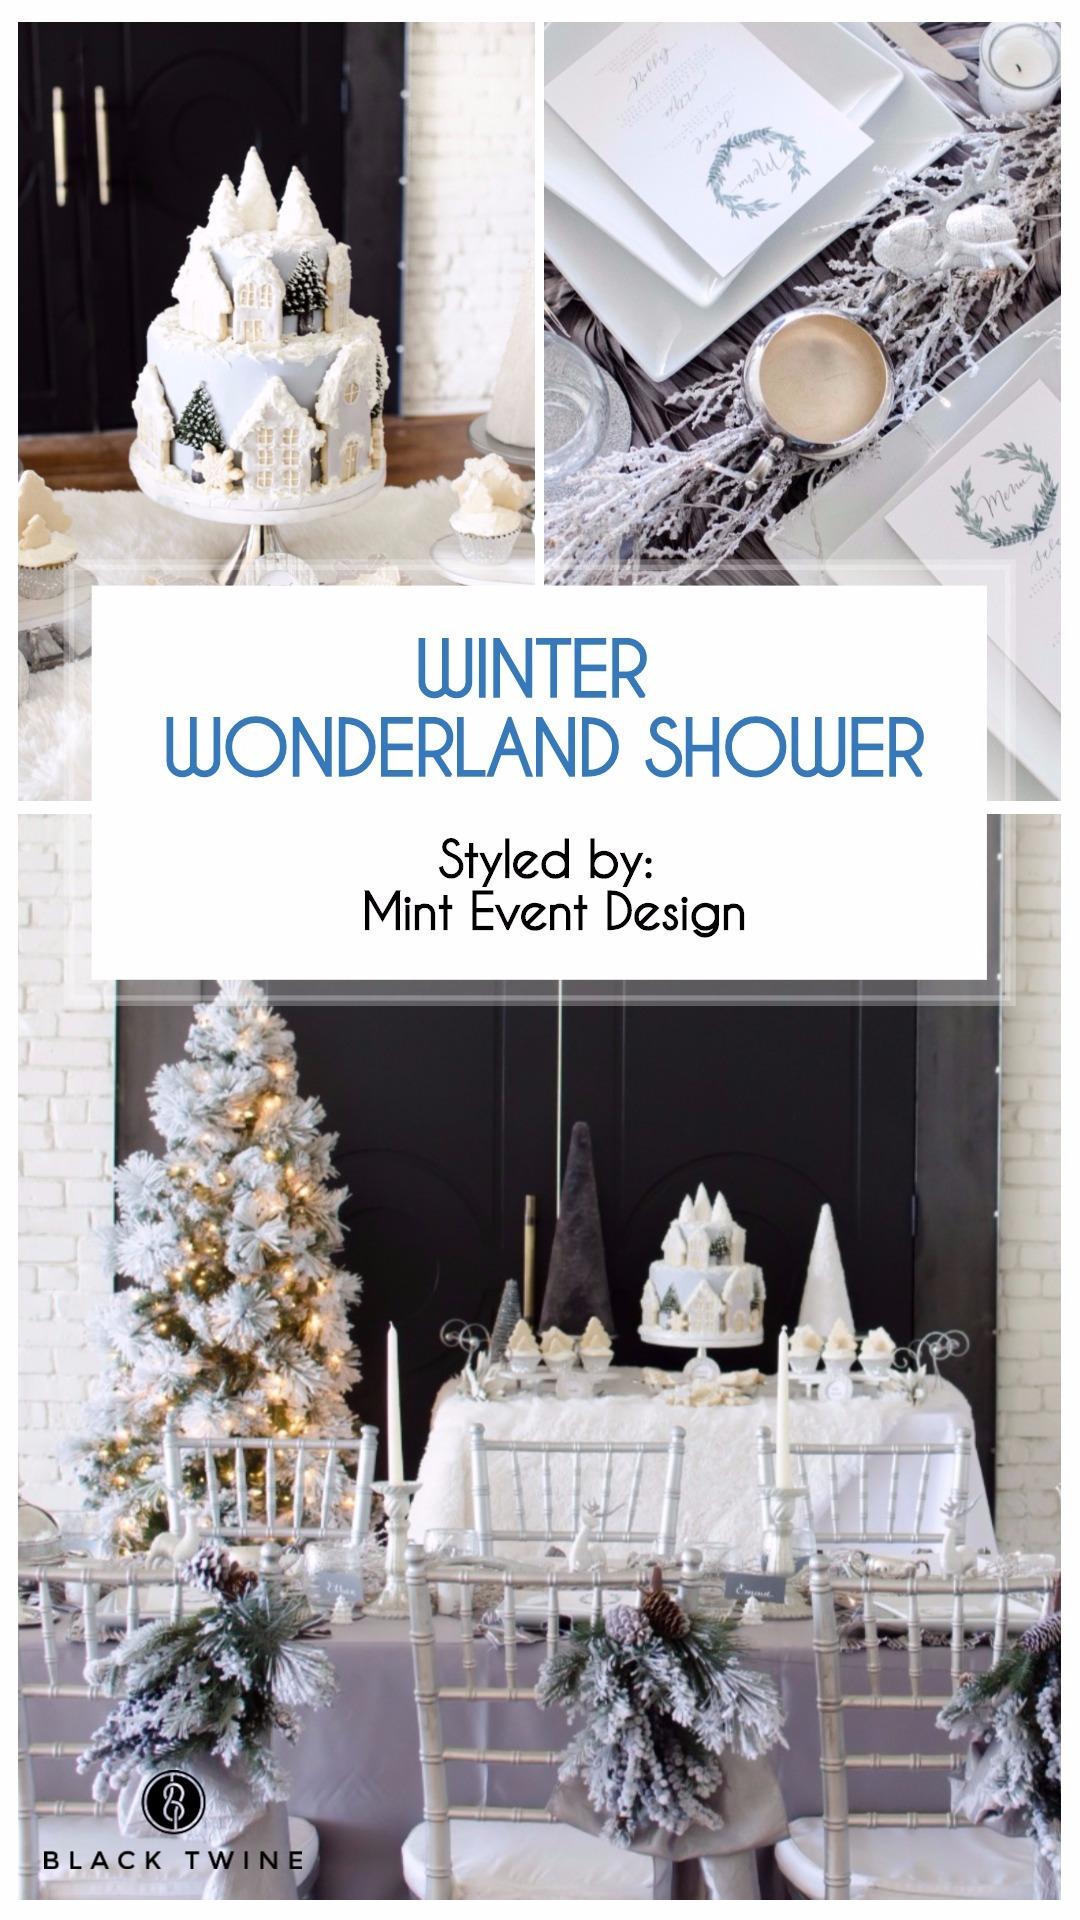 Winter Wonderland Shower Styled by Mint Event Design | Black Twine